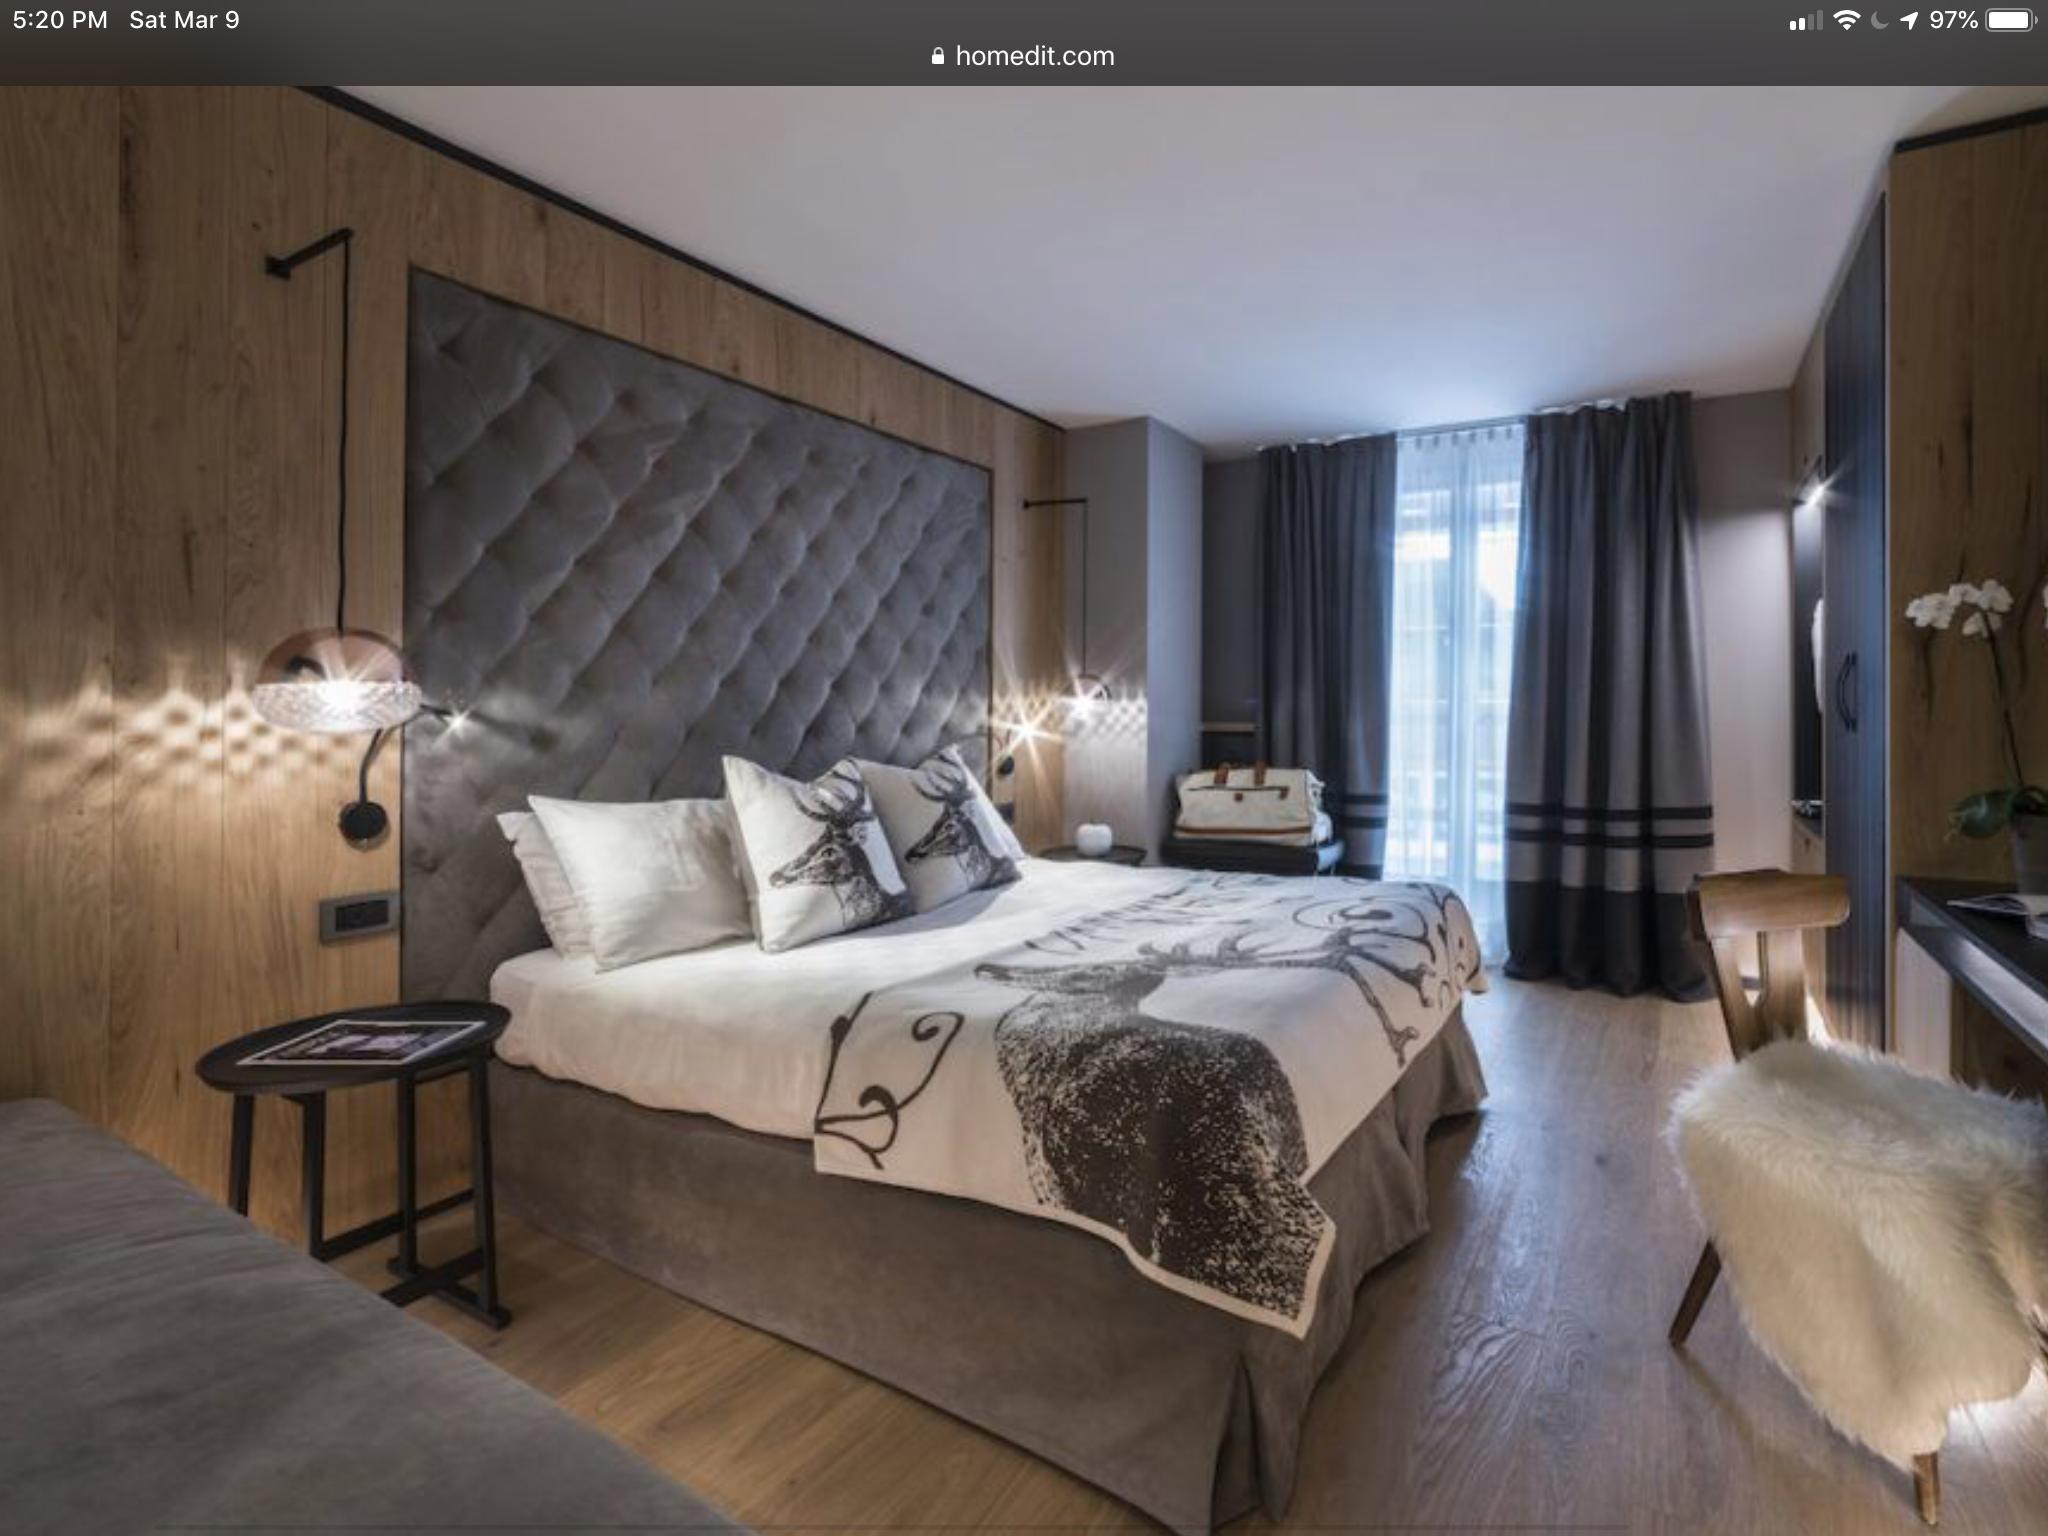 Pin by Karen Freeman on House interior Hotel room design